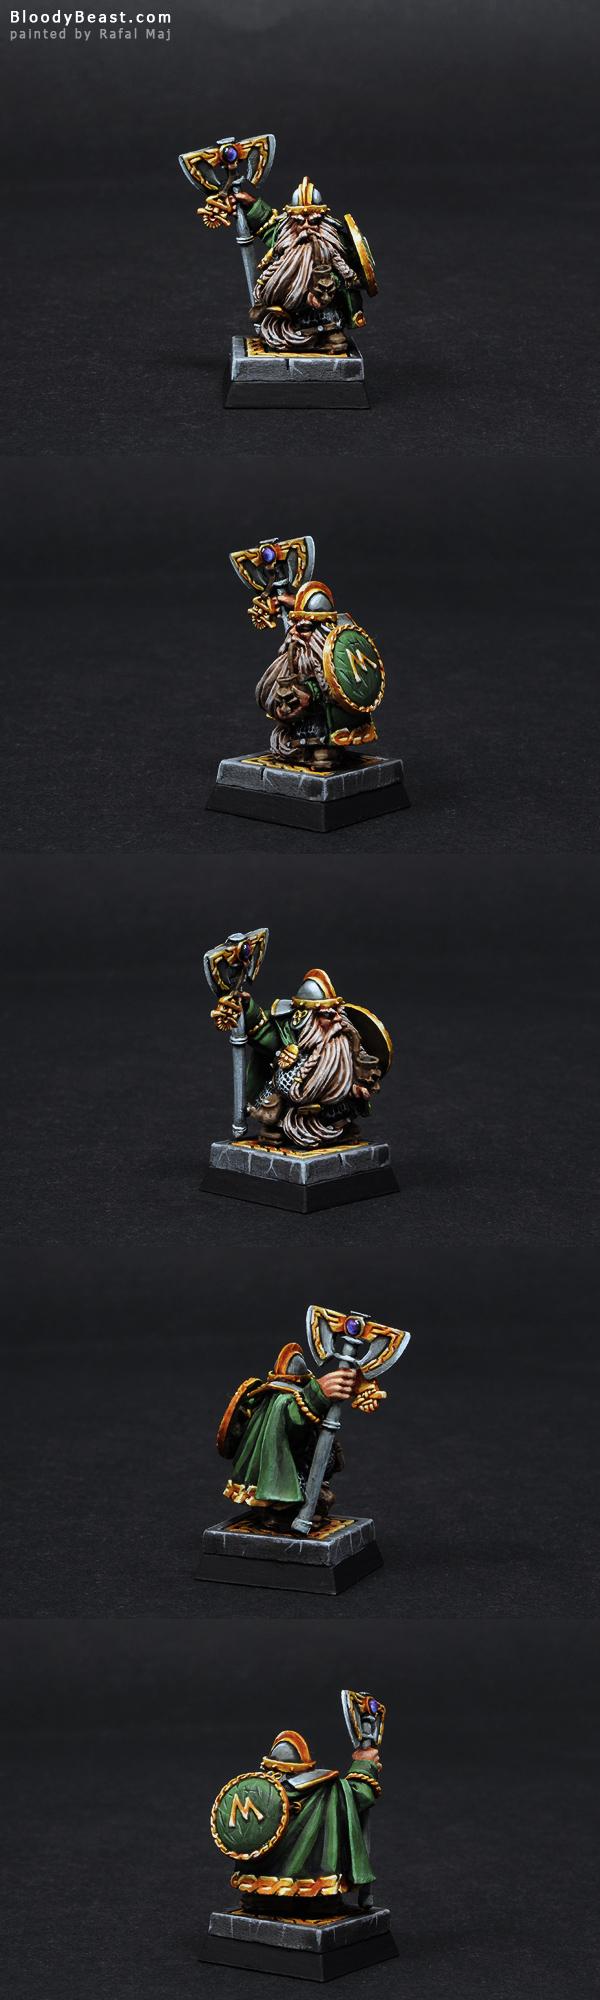 Dwarf Champion painted by Rafal Maj (BloodyBeast.com)